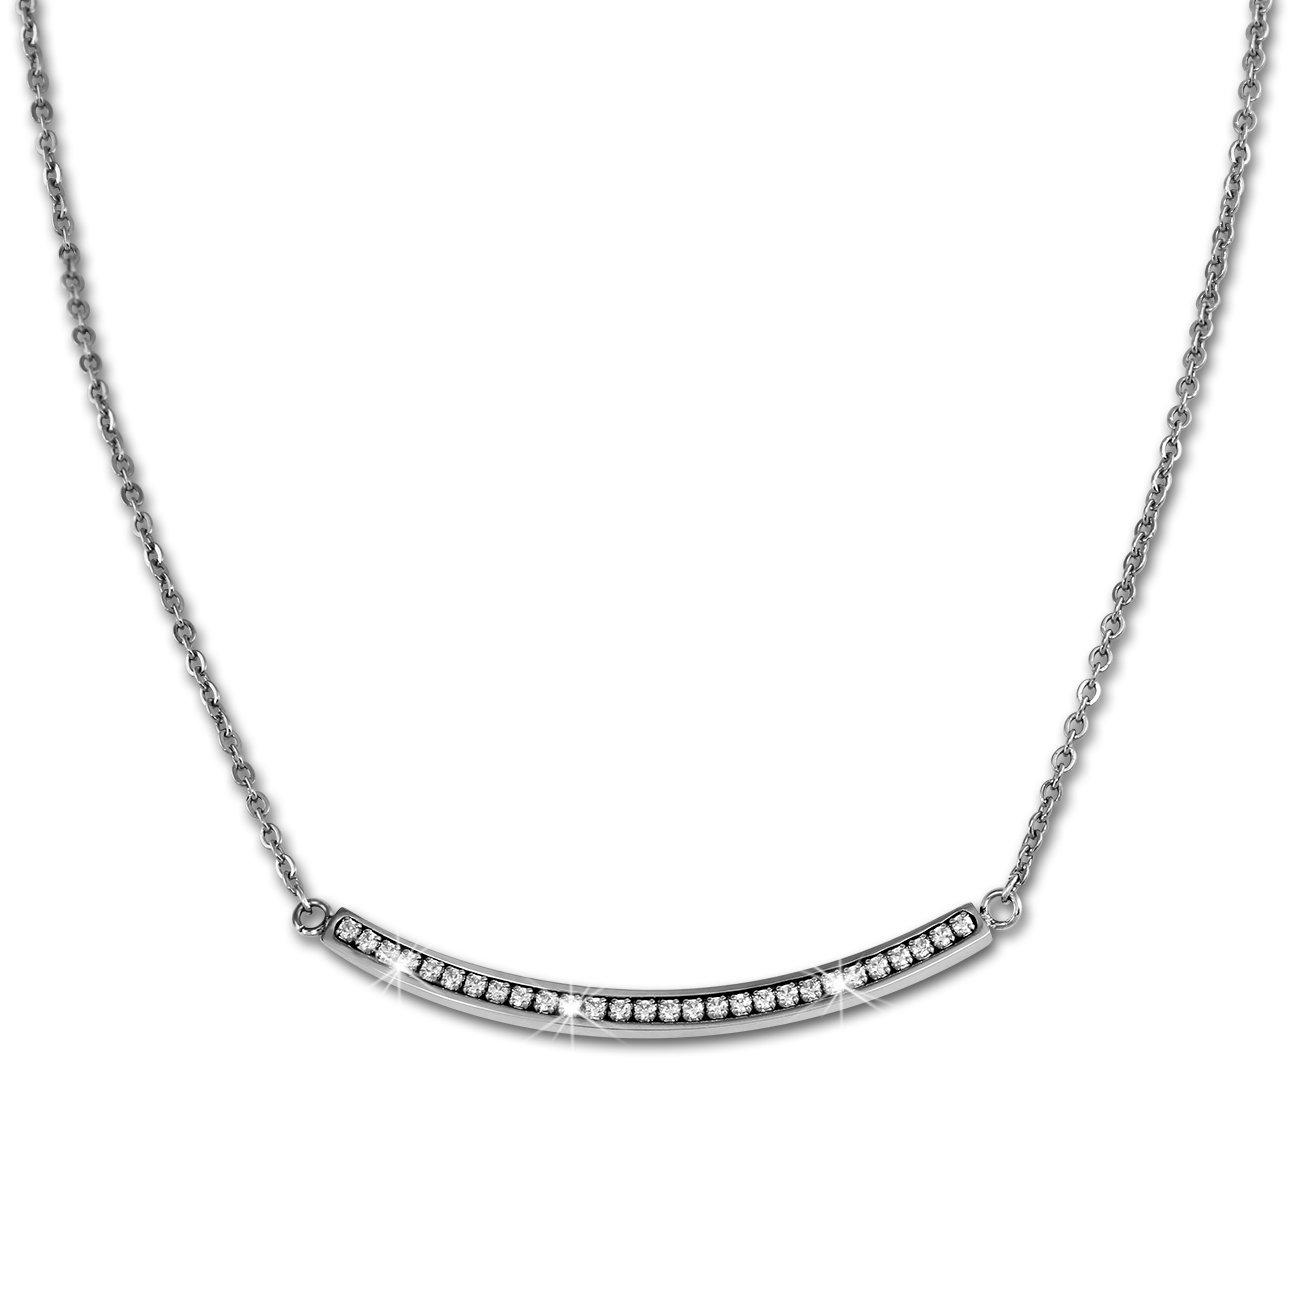 Halskette 84cm O-Kette Edelstahl 333er Rosegold Schmuck rose weiß Amello ESK101E